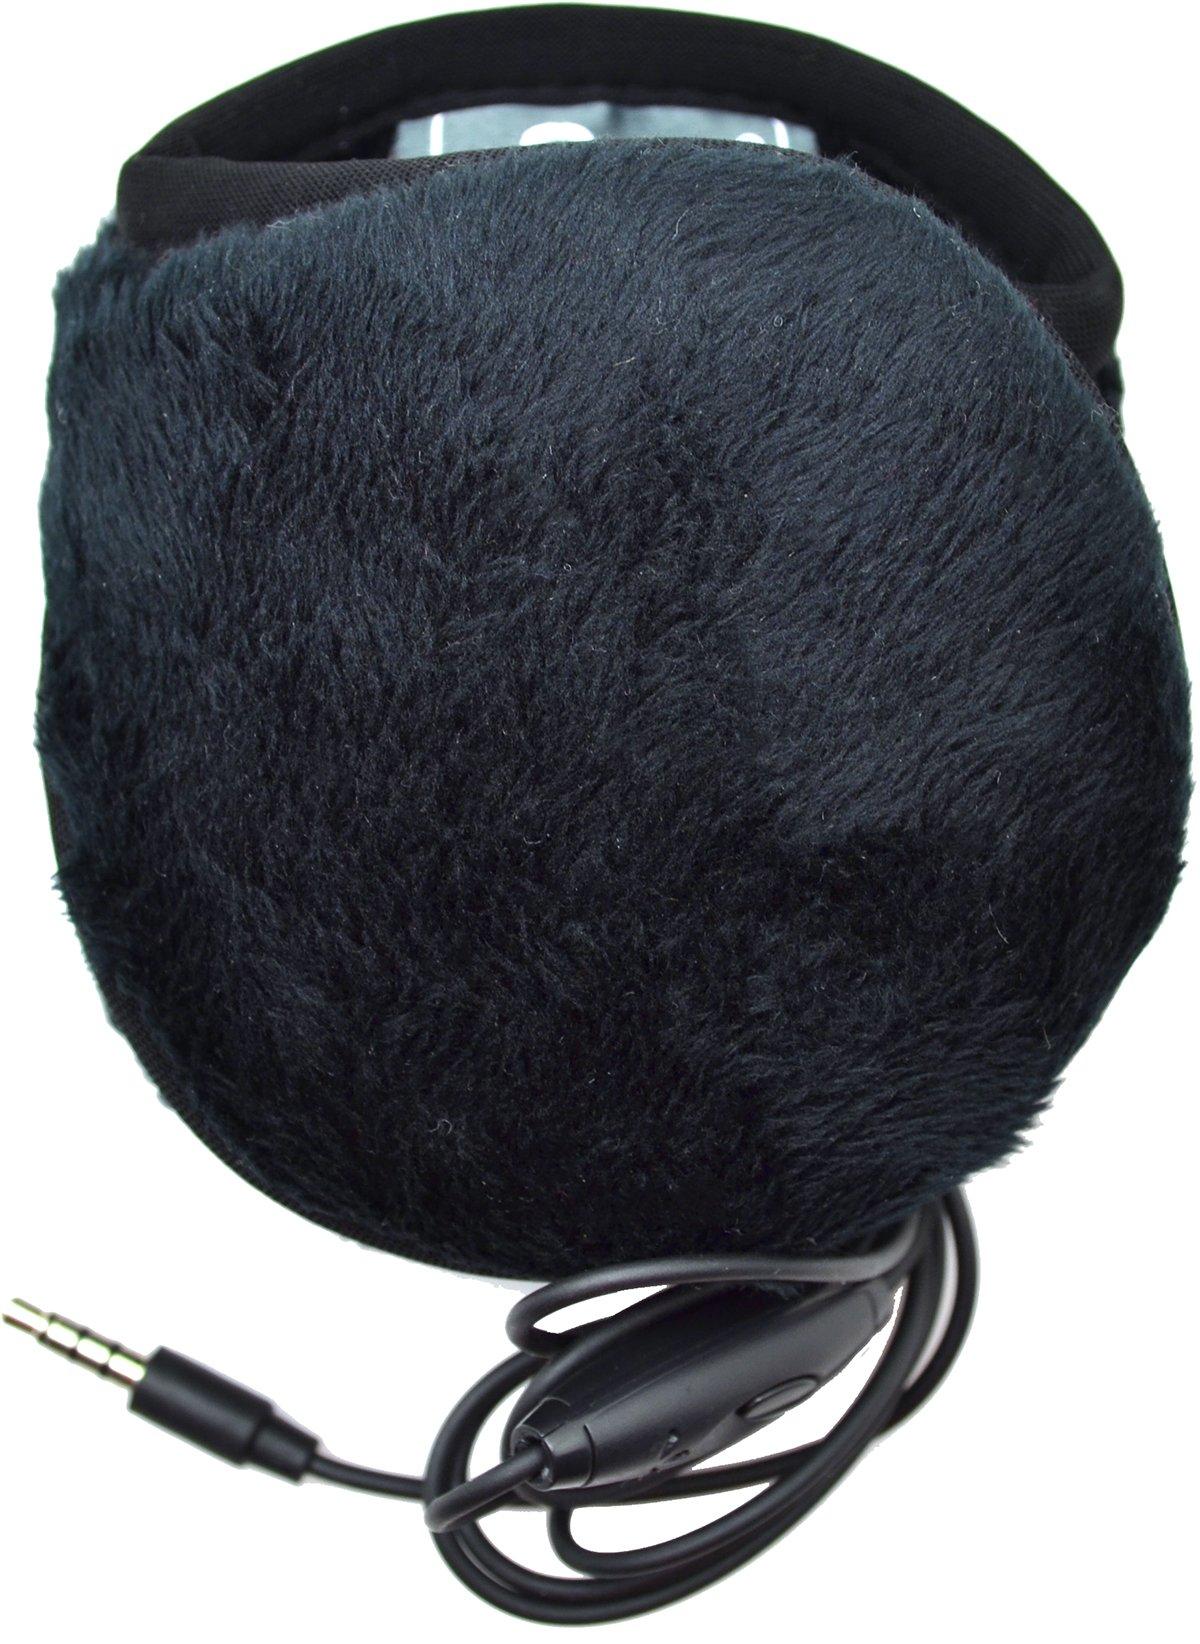 180s Women's Ear Warmers with Quantum Sound - Lush Fleece Black